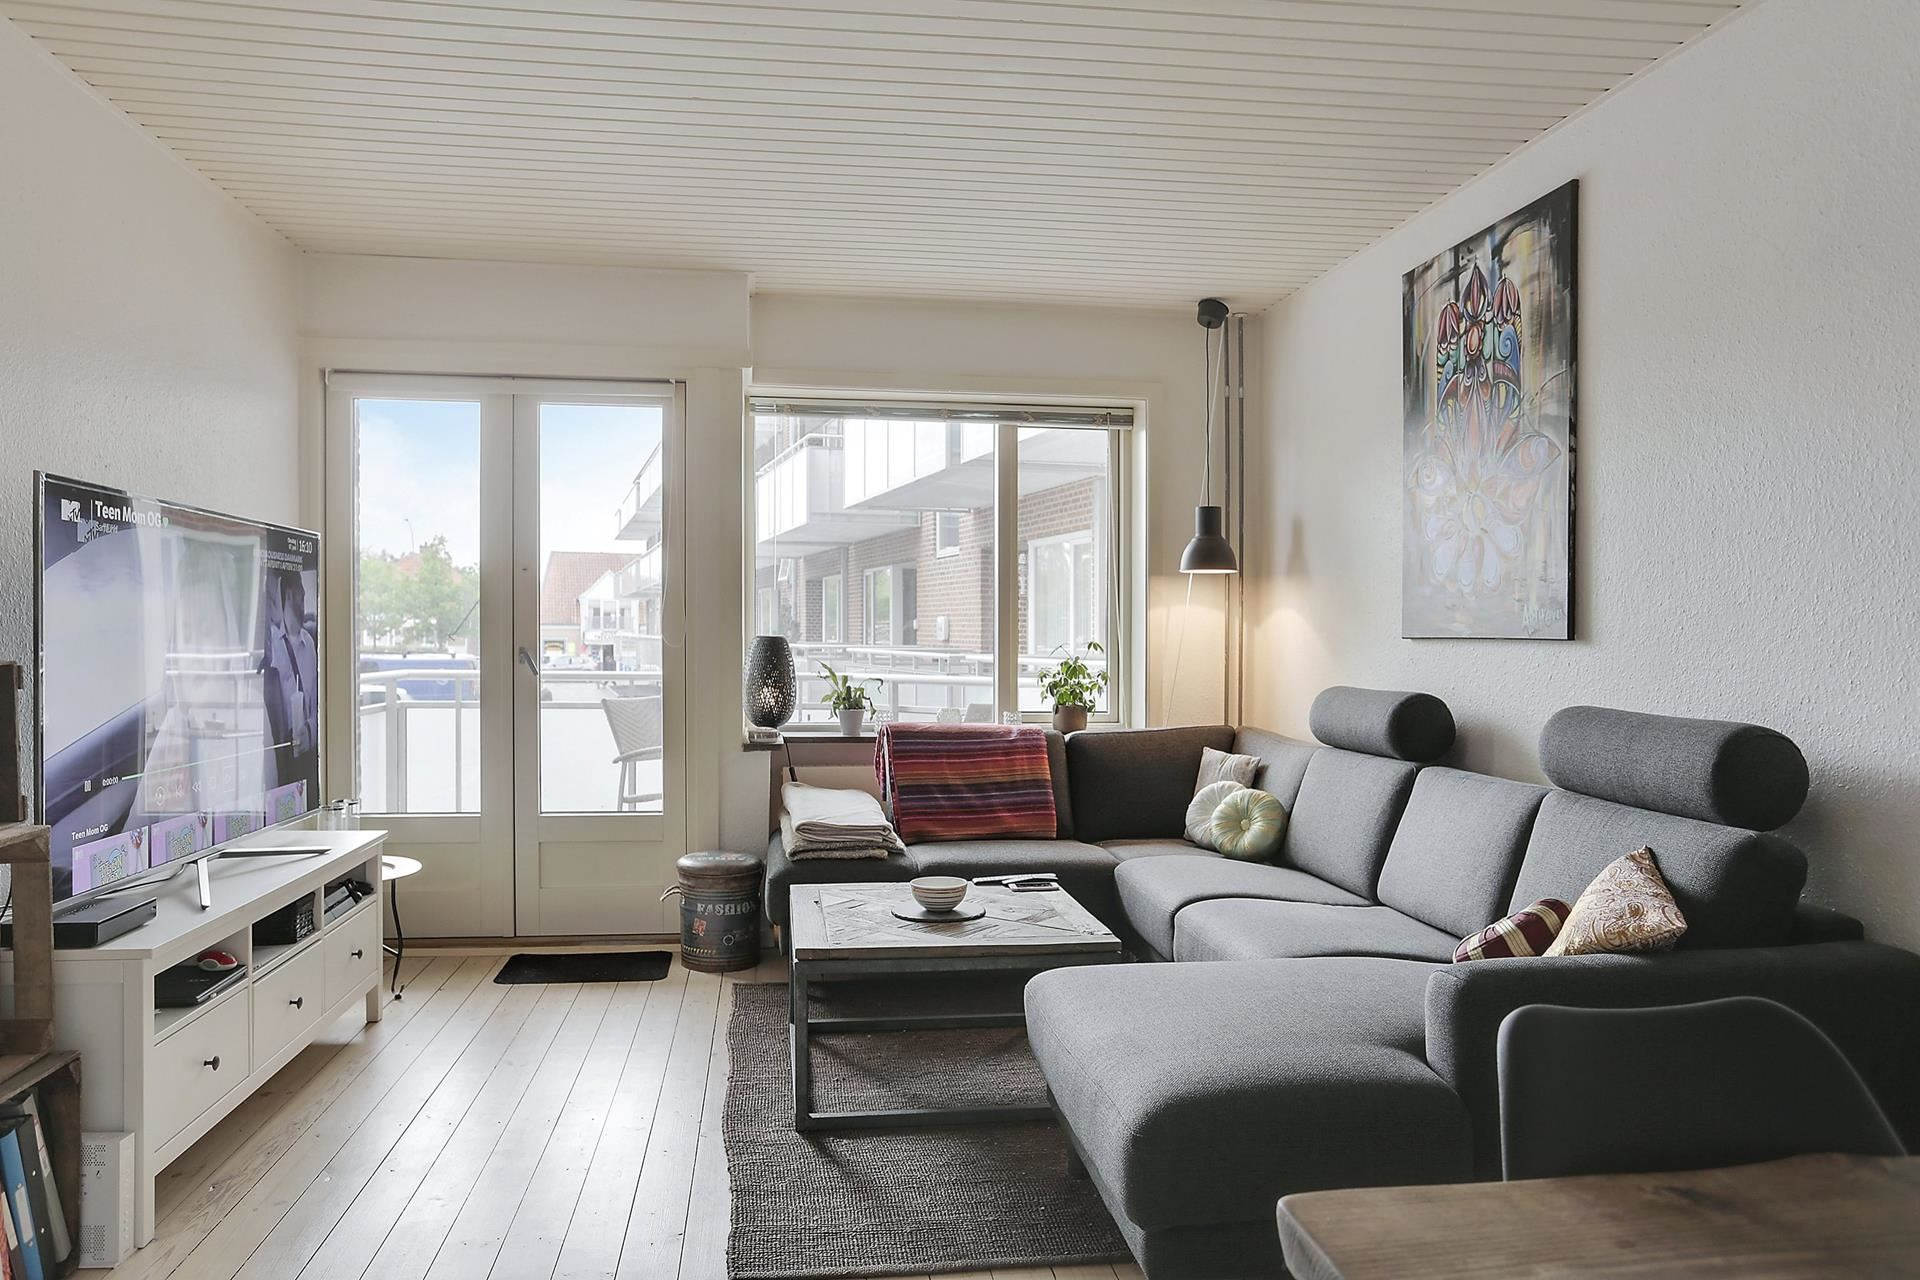 Nørre Boulevard 132, st tv, 4600 Køge